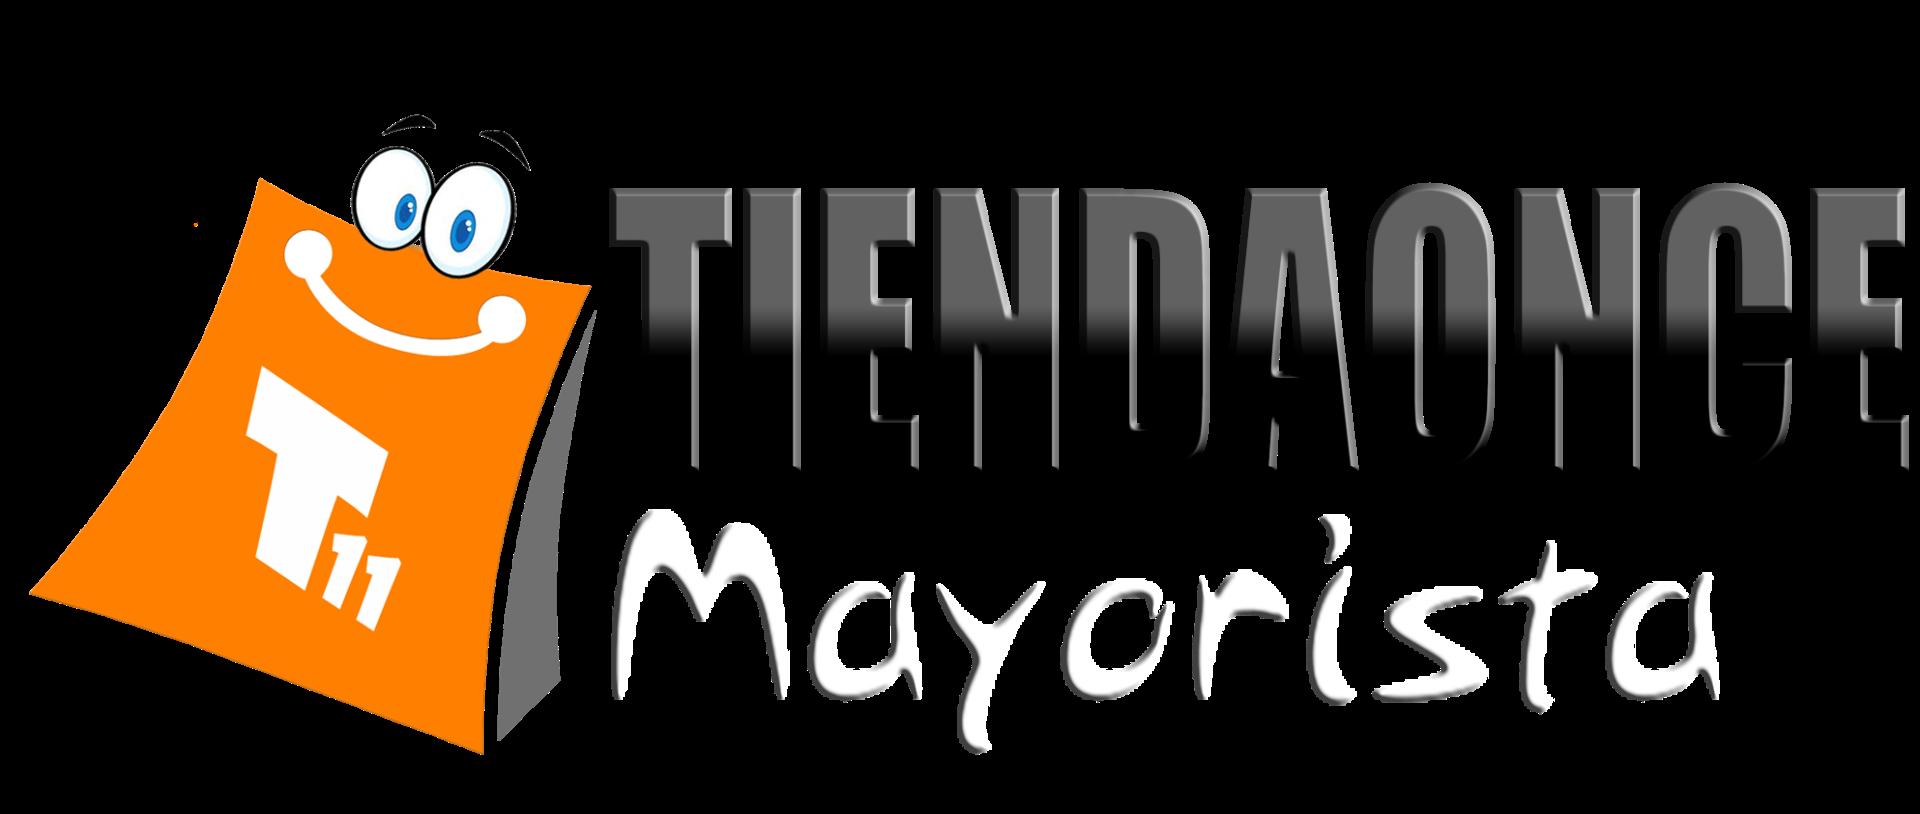 TIENDAONCE MAYORISTA